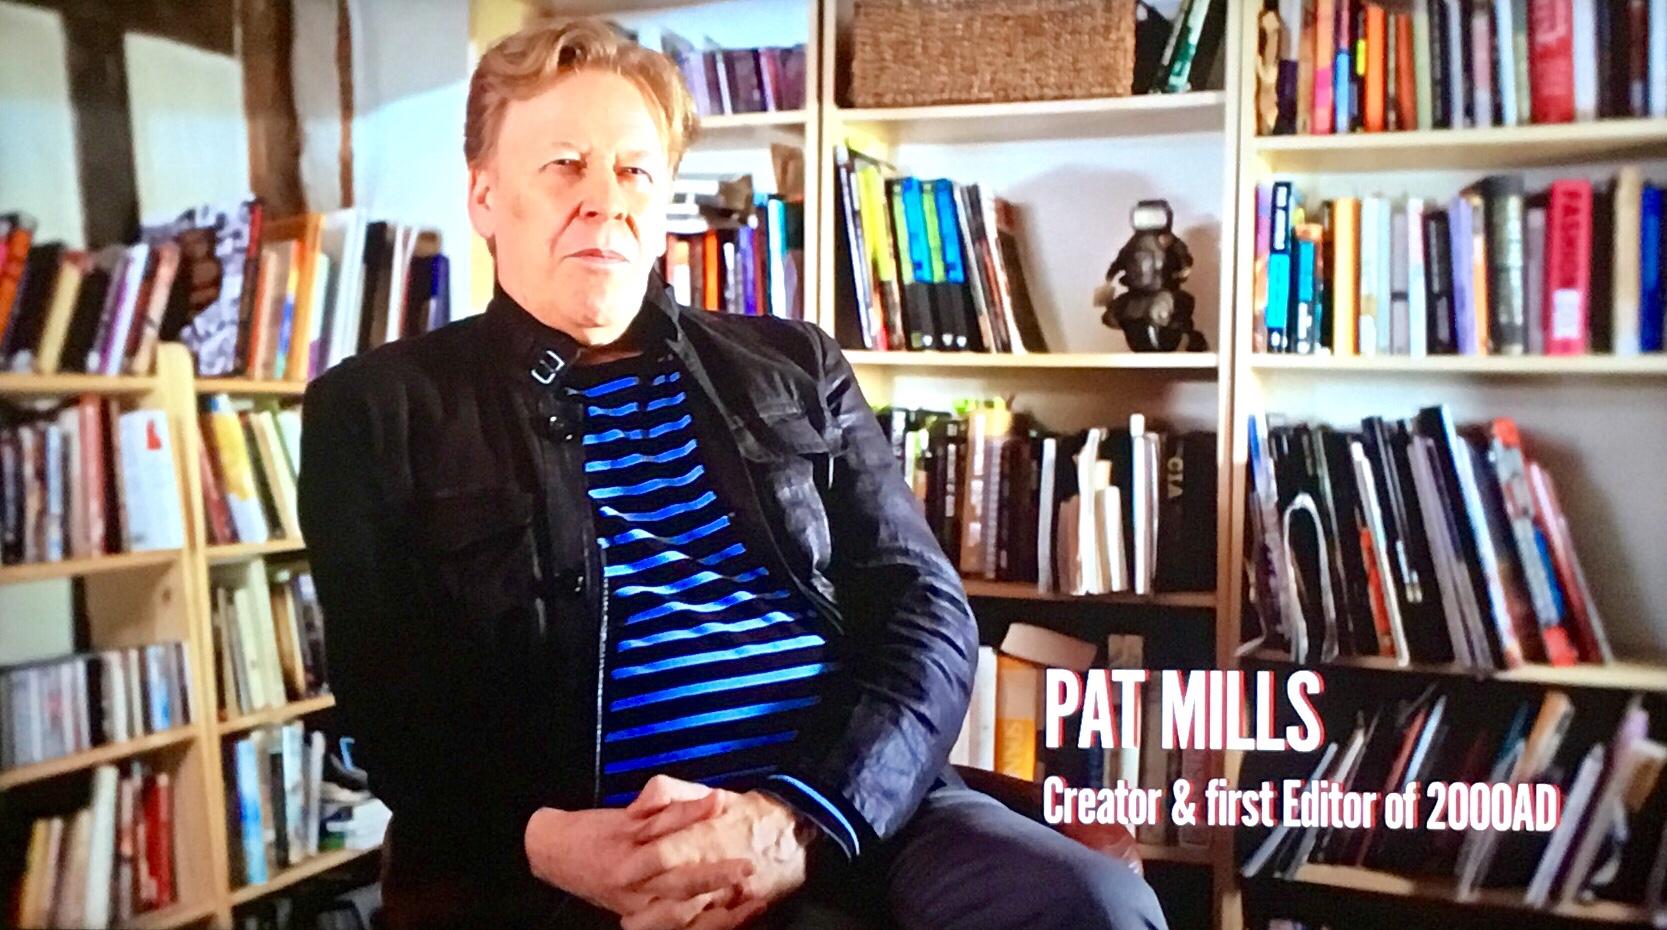 Creator of 2000AD, Pat Mills speaks of its origins.